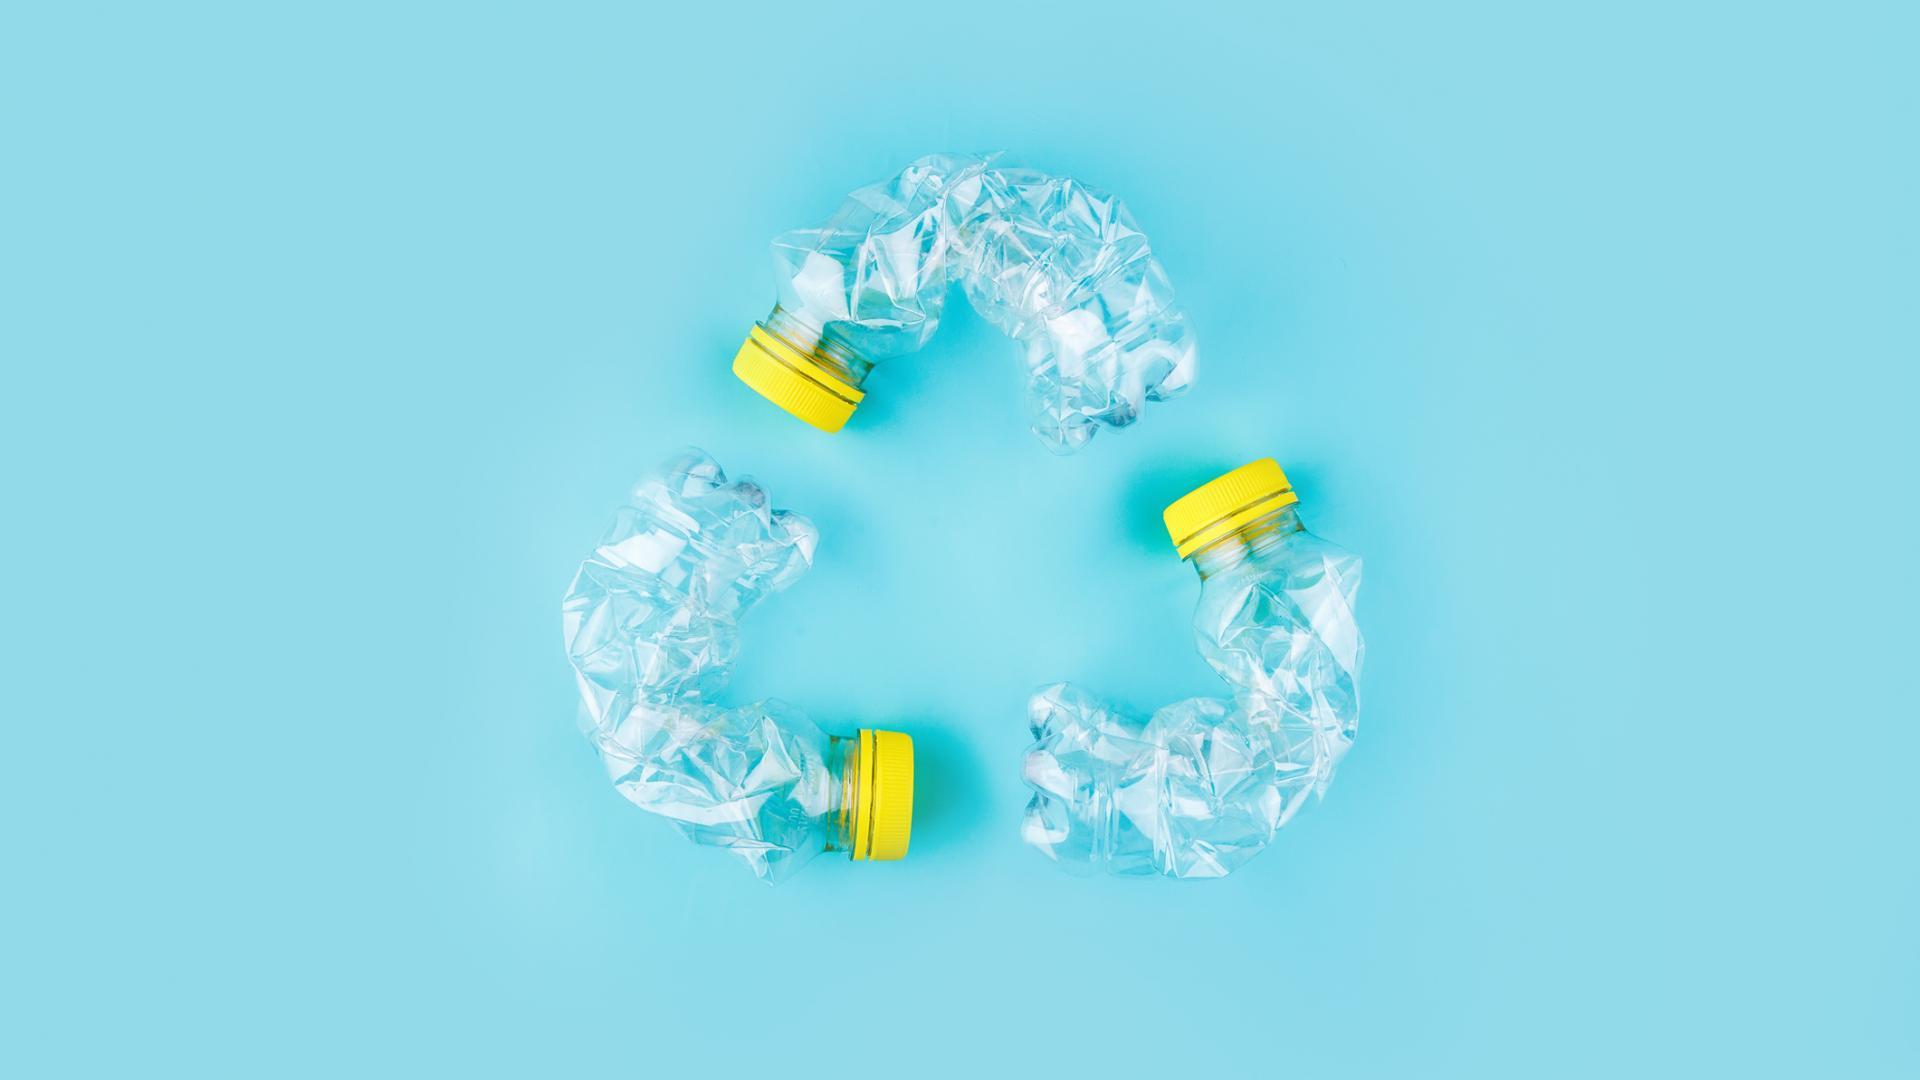 plastik verpackung nachhaltig recycling